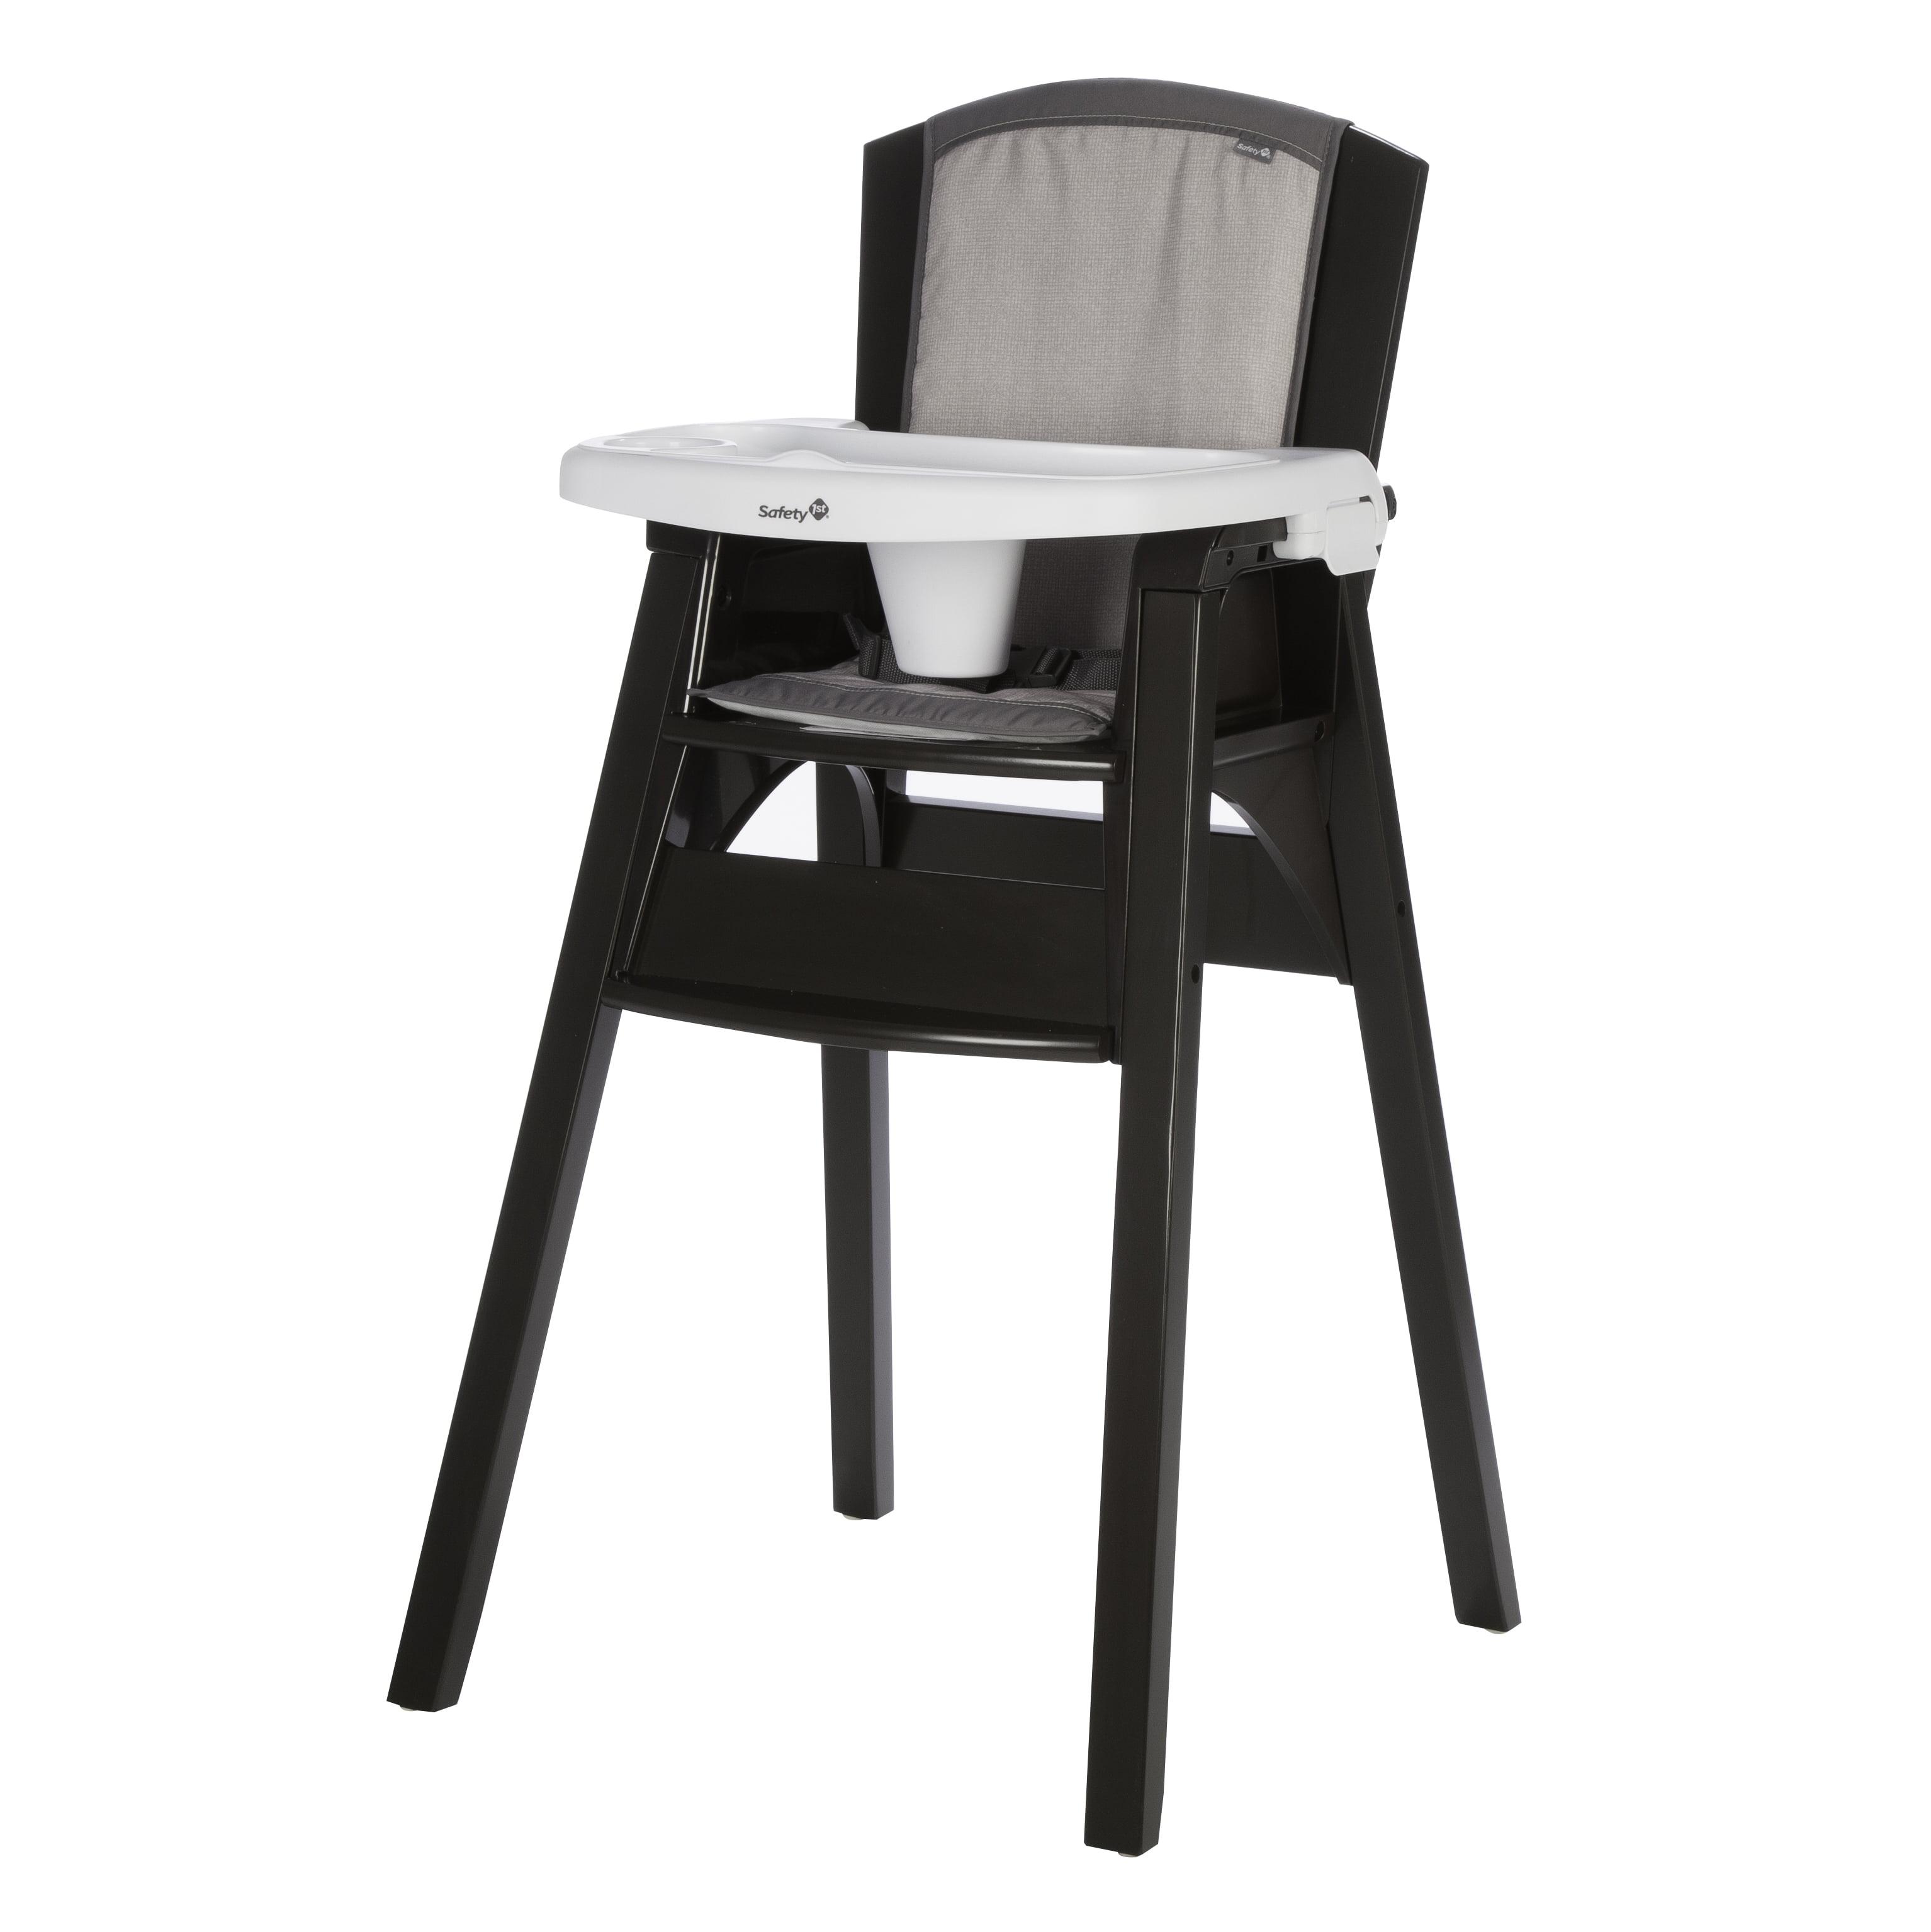 Safety 1st Wood High Chair Beaumont Walmartcom